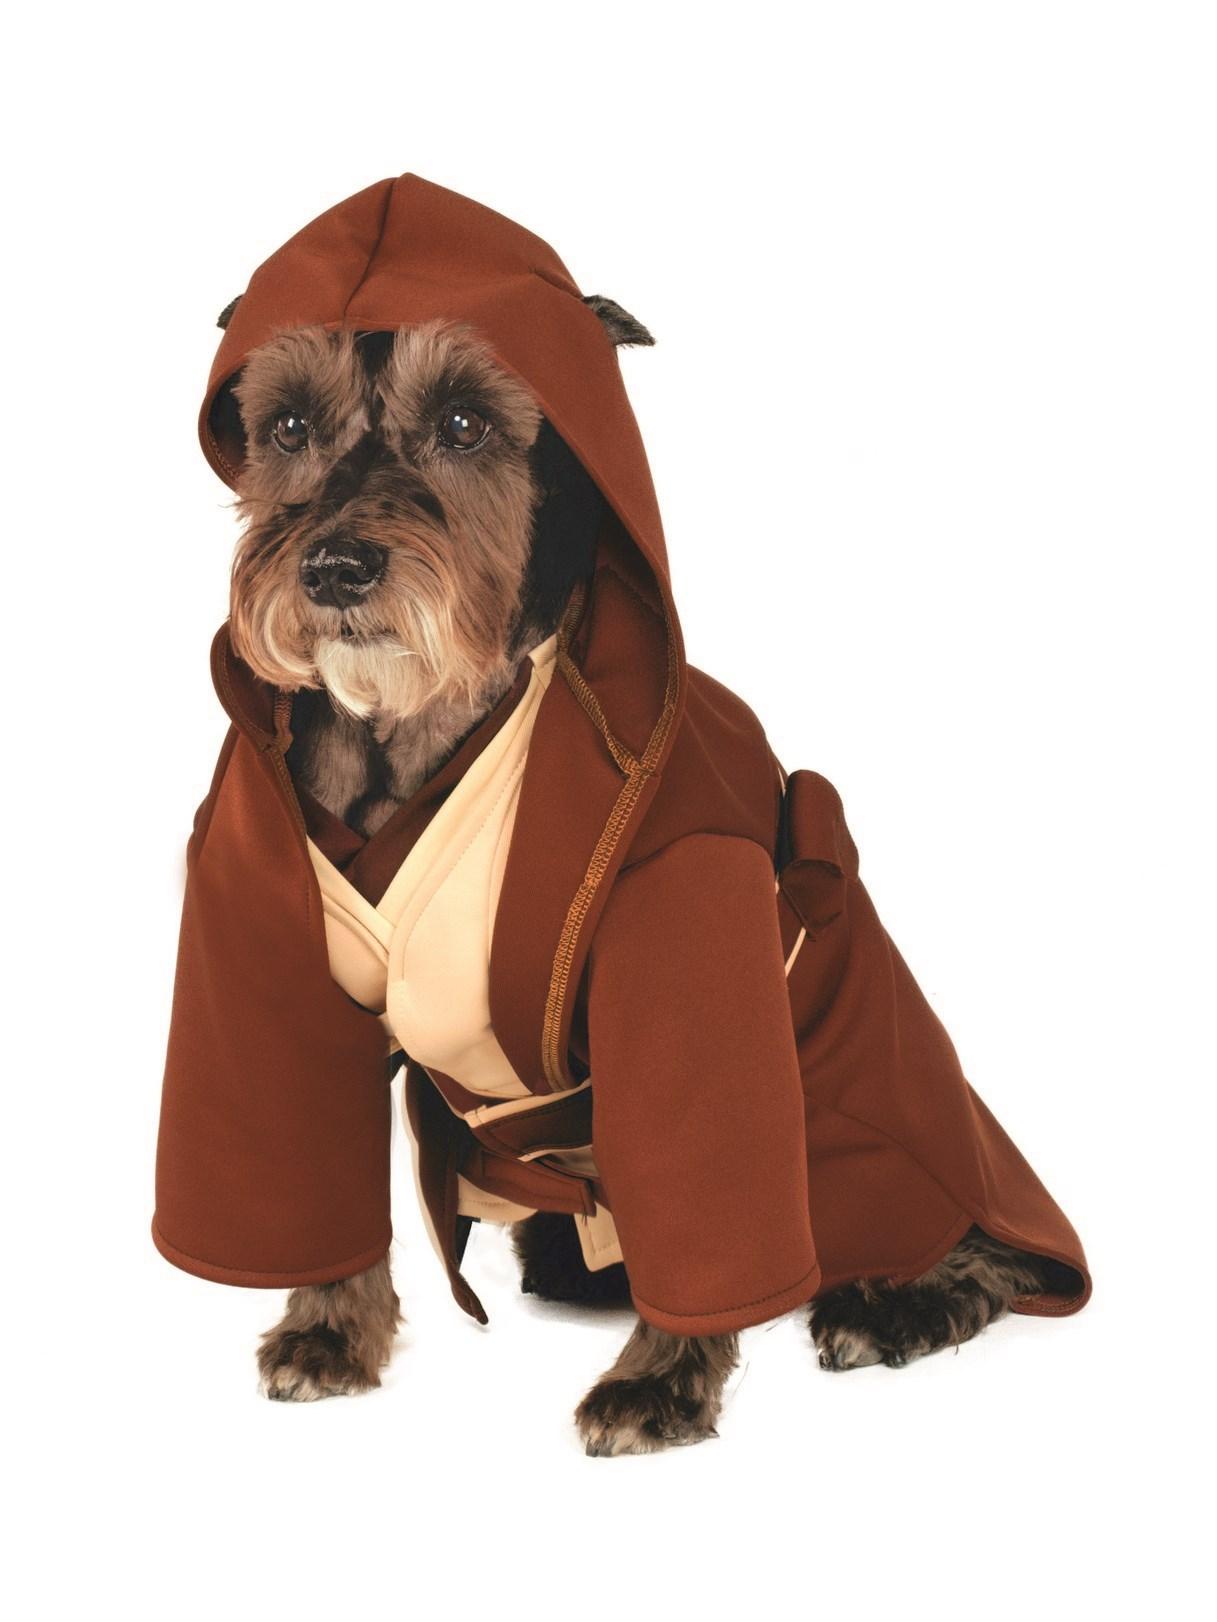 Star Wars Jedi Robe Costume For Pets